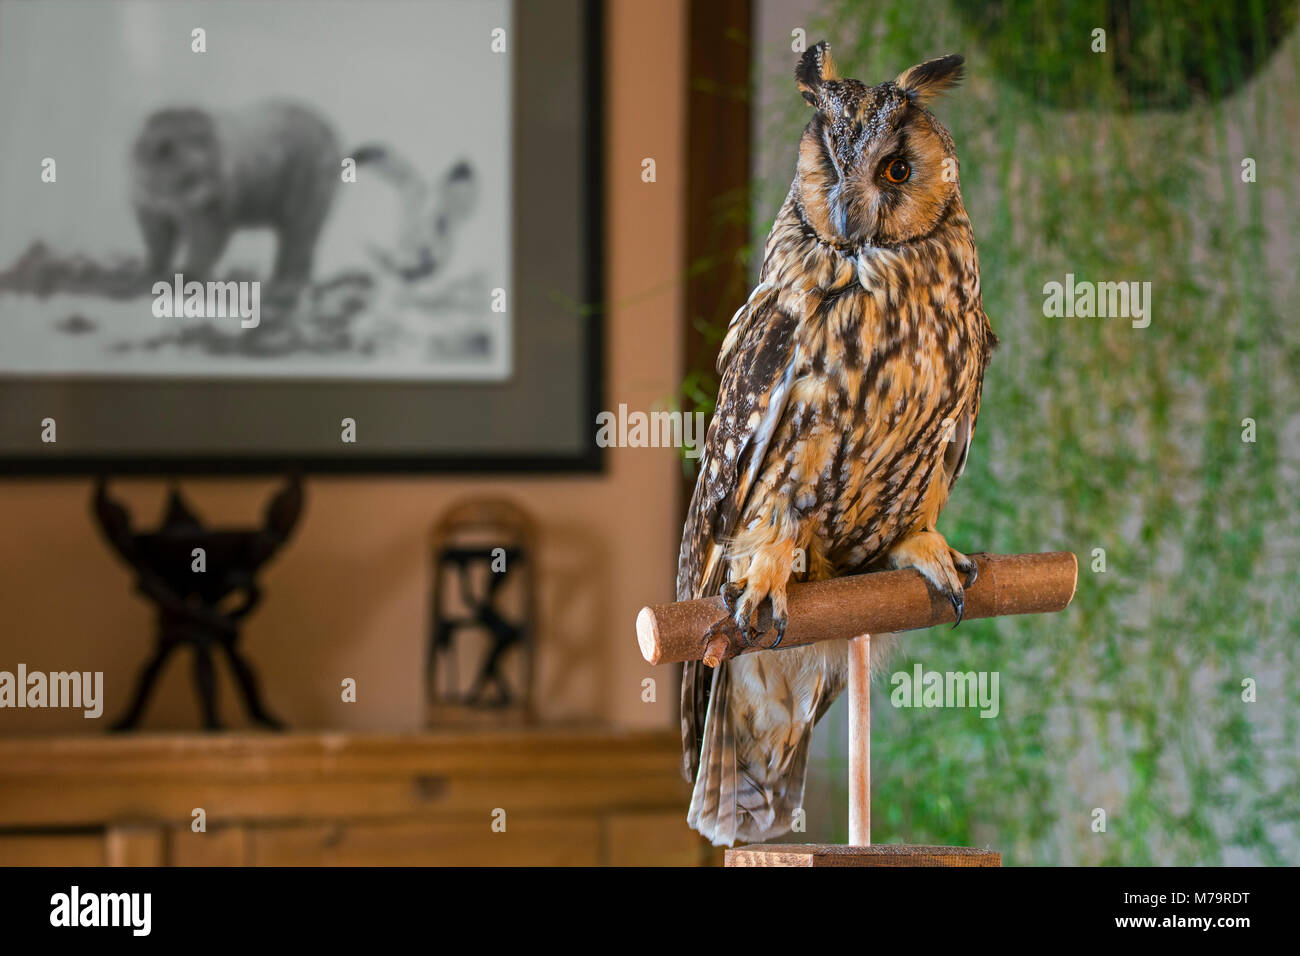 Stuffed long-eared owl (Asio otus / Strix otus) mounted lifelike on branch in living room at home - Stock Image